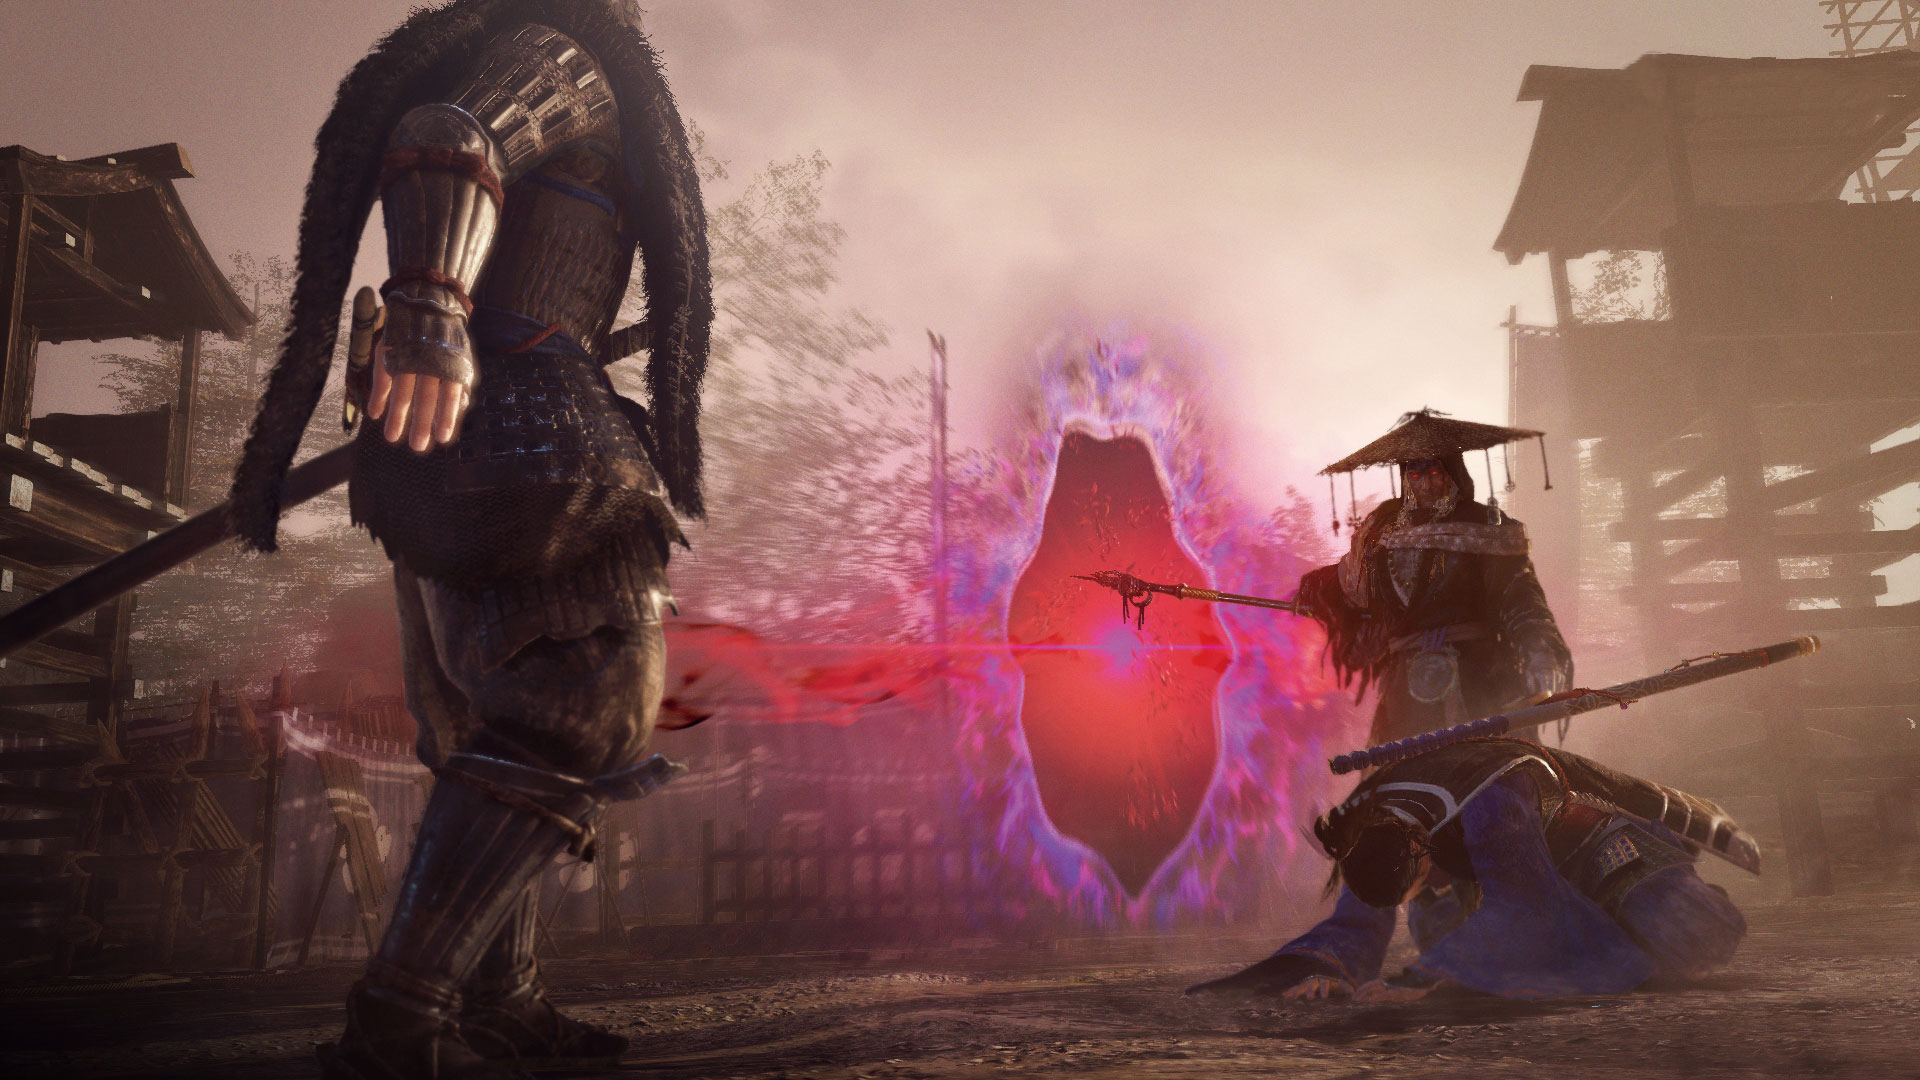 PS4大作《仁王2》新情报 大战魑魅魍魉非常过瘾